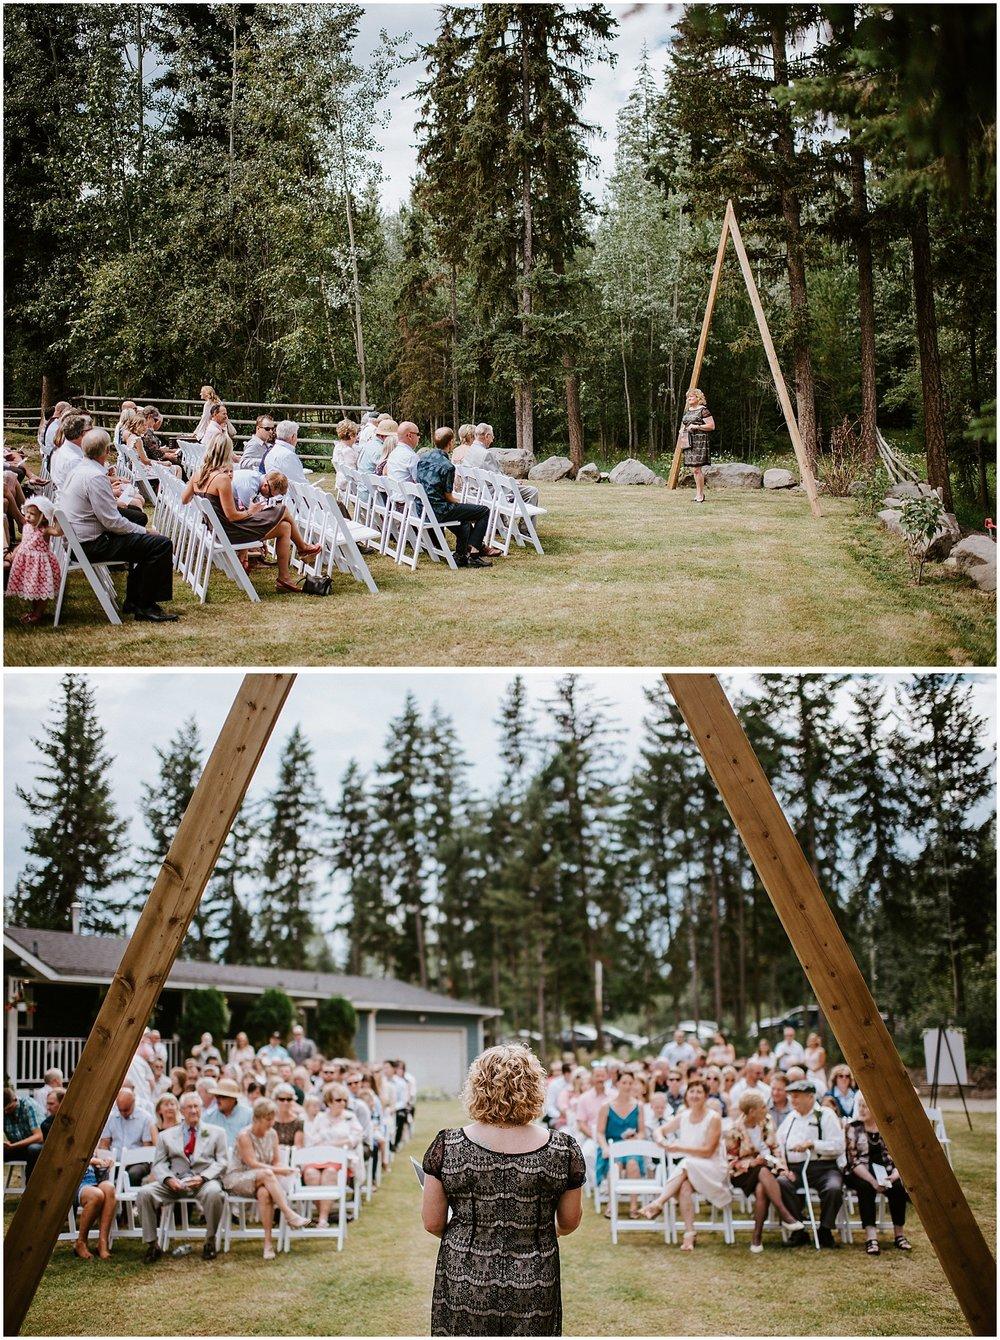 Quesnel_wedding_vancouver_bc_elopement_Pinnacles_Provincial_Park_0183.jpg